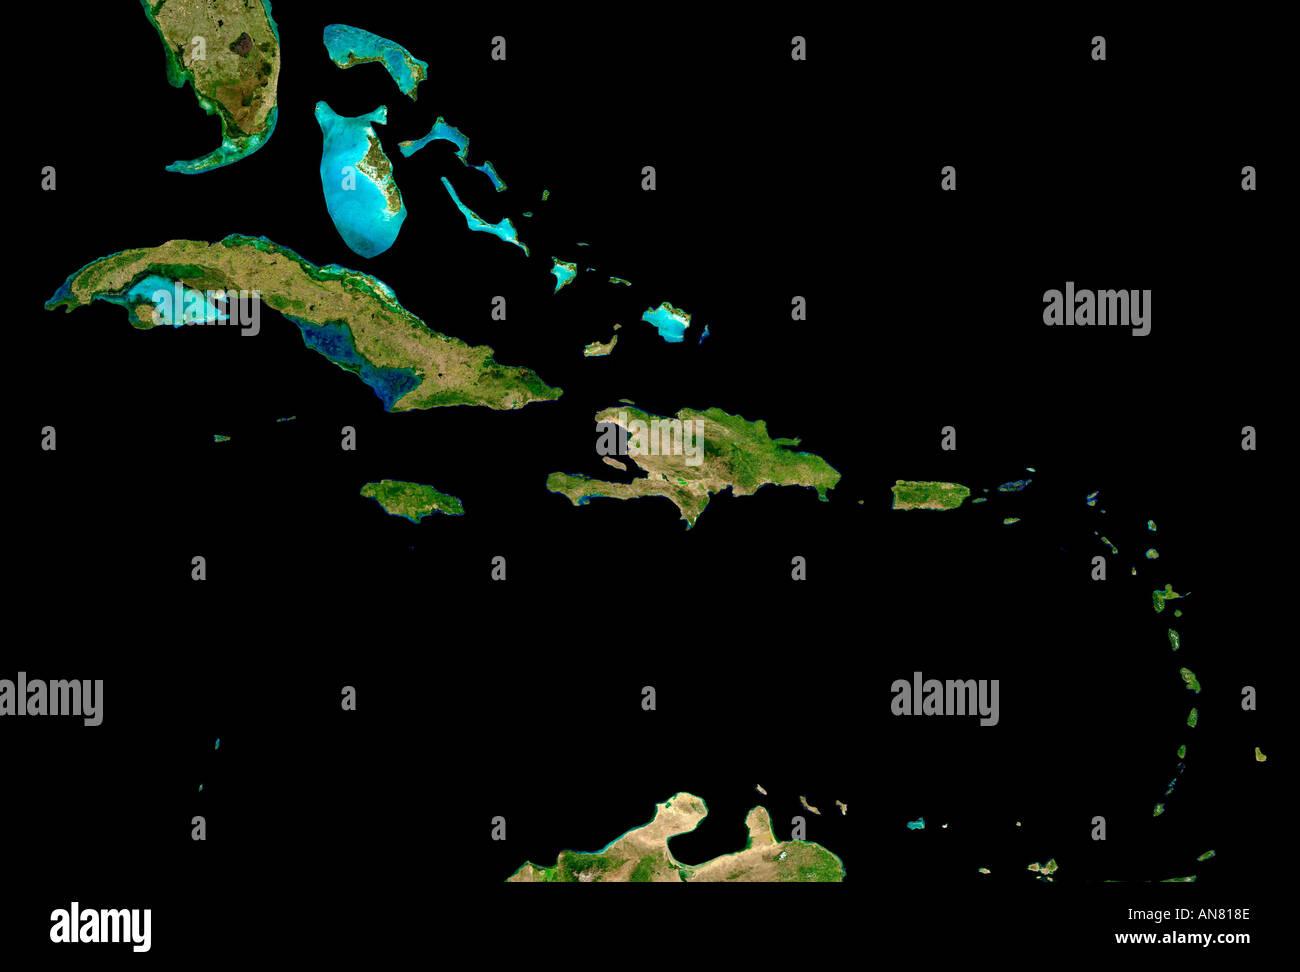 Map Satellite Geography Bahamas Stock Photos & Map Satellite ... on intellicast caribbean, outline map of the caribbean, us and caribbean, winds of the caribbean, america map of the caribbean, show map of the caribbean, relief map of the caribbean, weather large maps caribbean, waterways of the caribbean, sports of the caribbean, map of south caribbean, full map of caribbean, the map of the caribbean, temperature map of the caribbean, printable map caribbean, home of the caribbean, google maps of the caribbean, attractions of the caribbean, labeled map of the caribbean, political map of the caribbean,